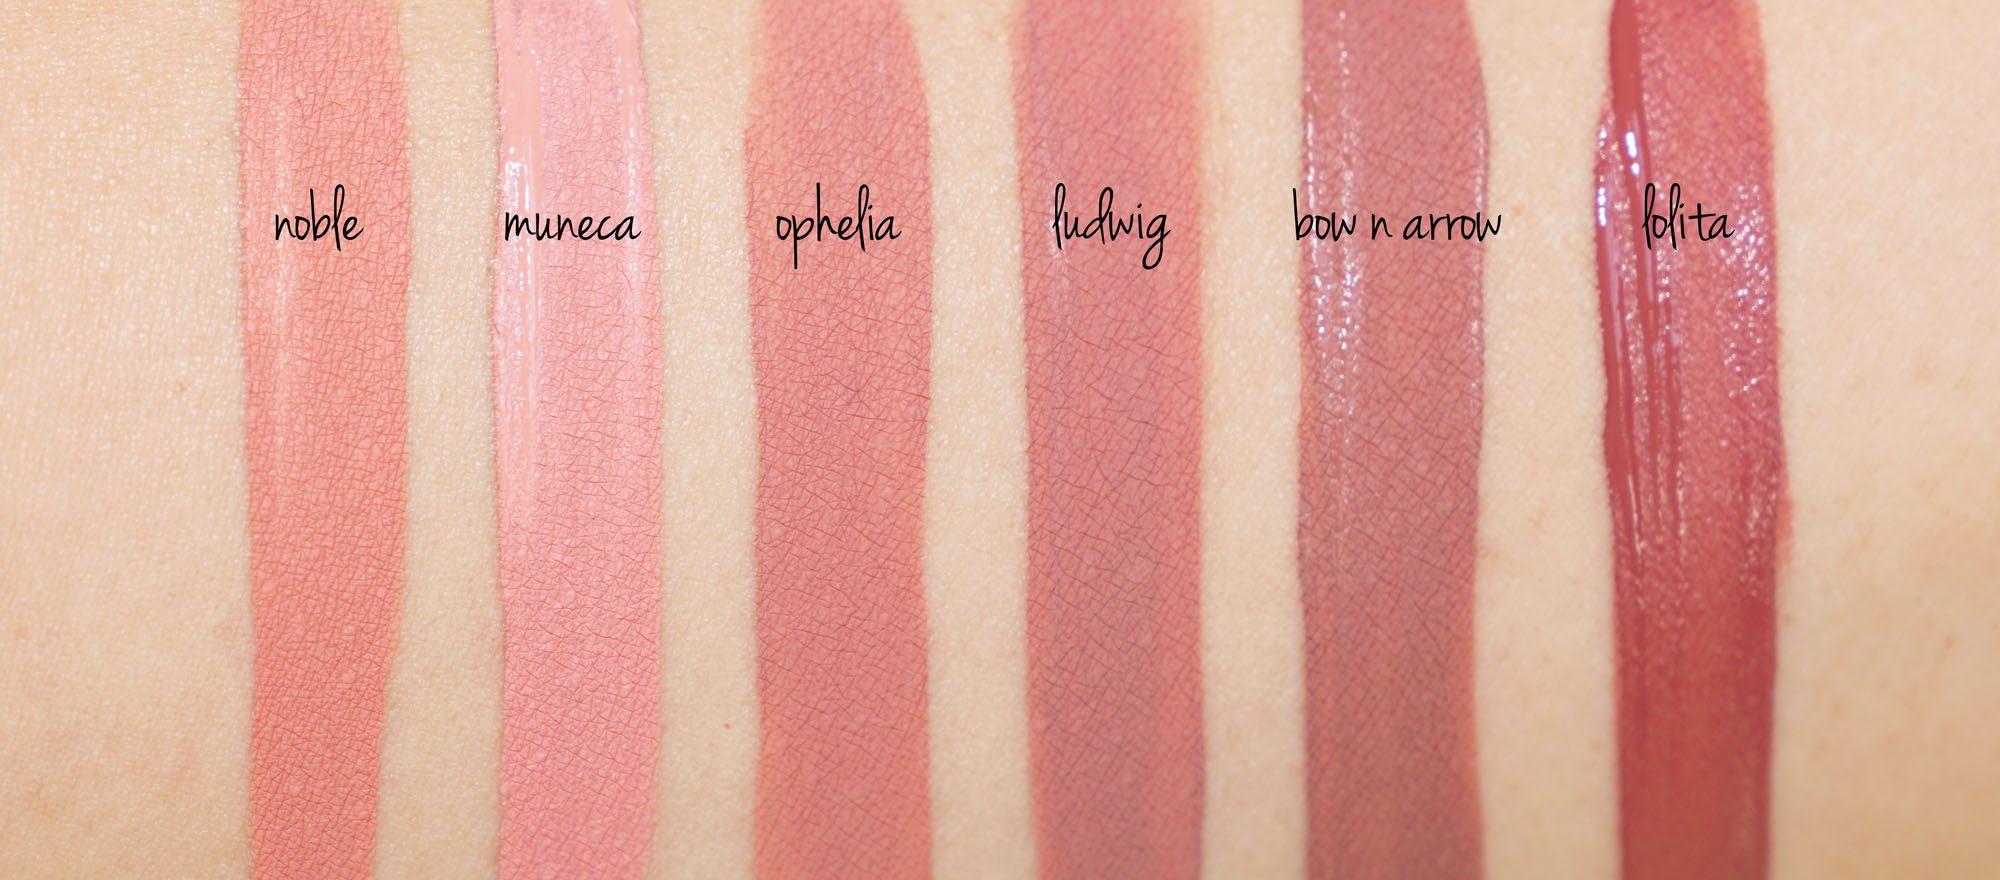 Kat Von D Beauty Everlasting Liquid Lipstick Noble, Muneca ...